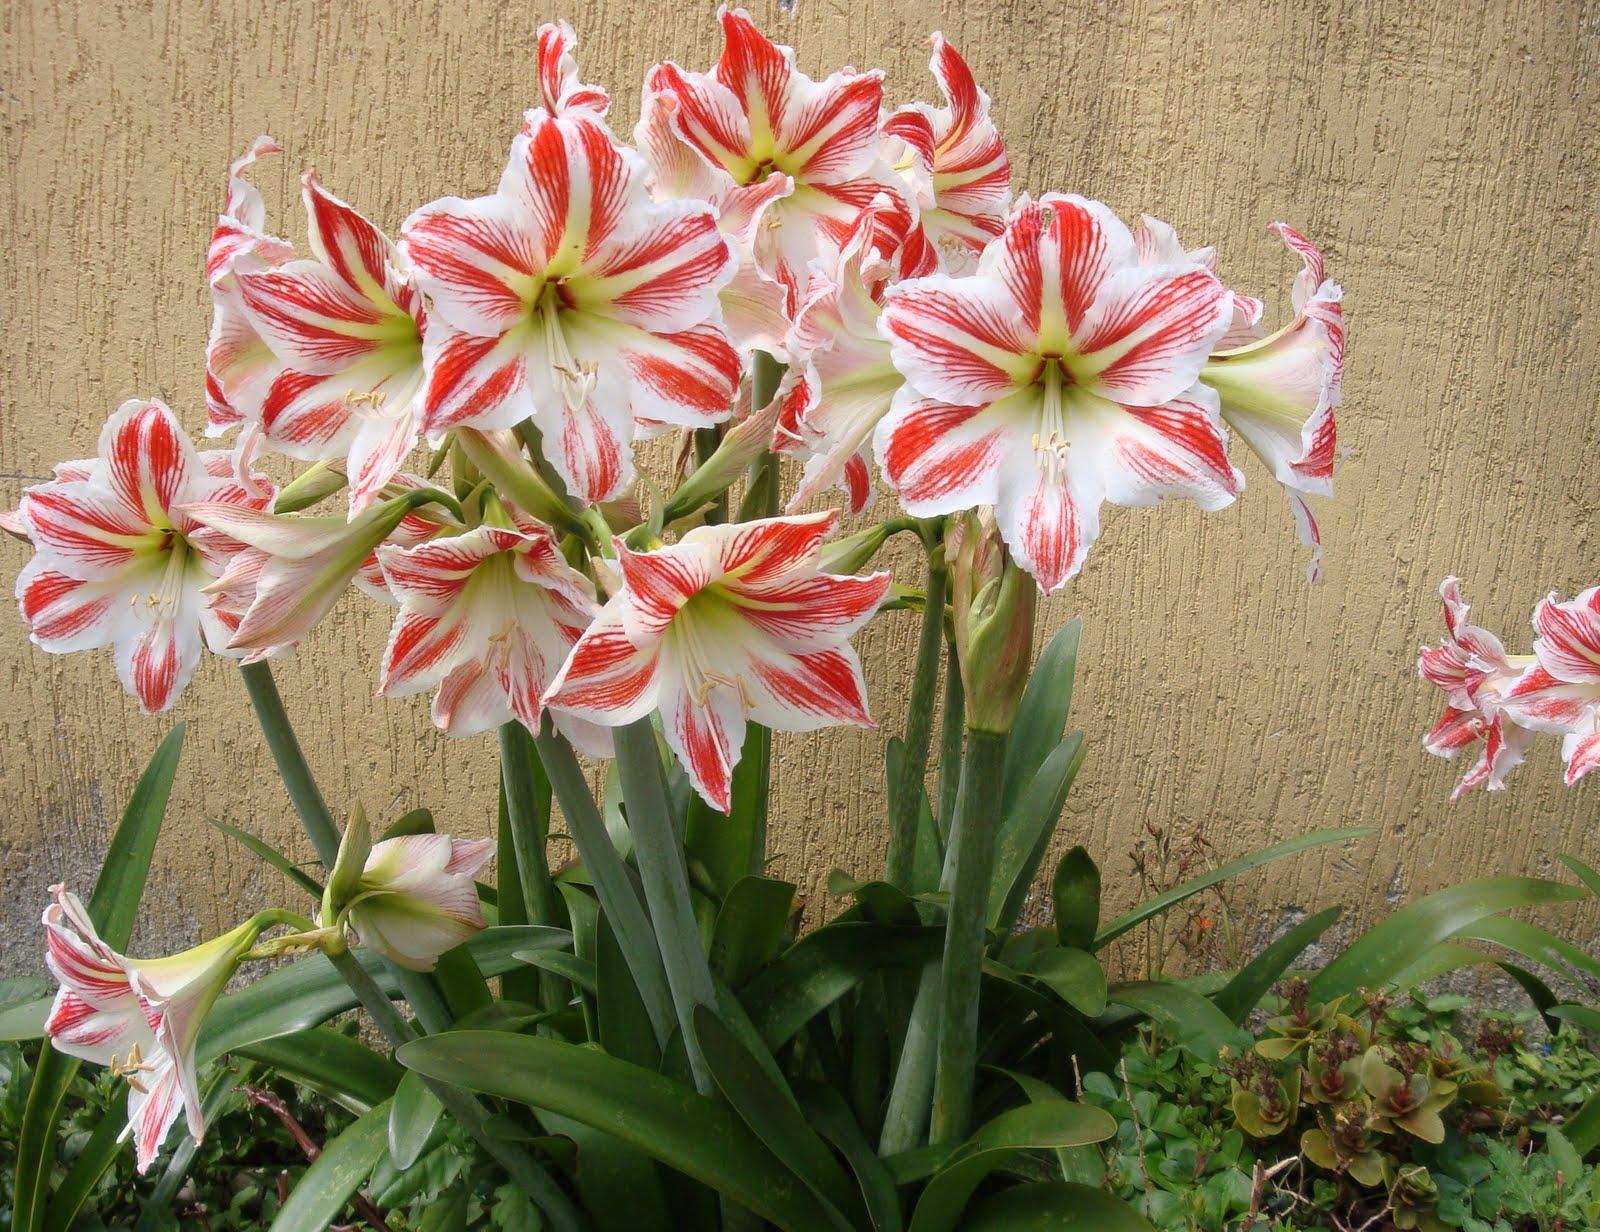 Цветы луковичные фото луковицы